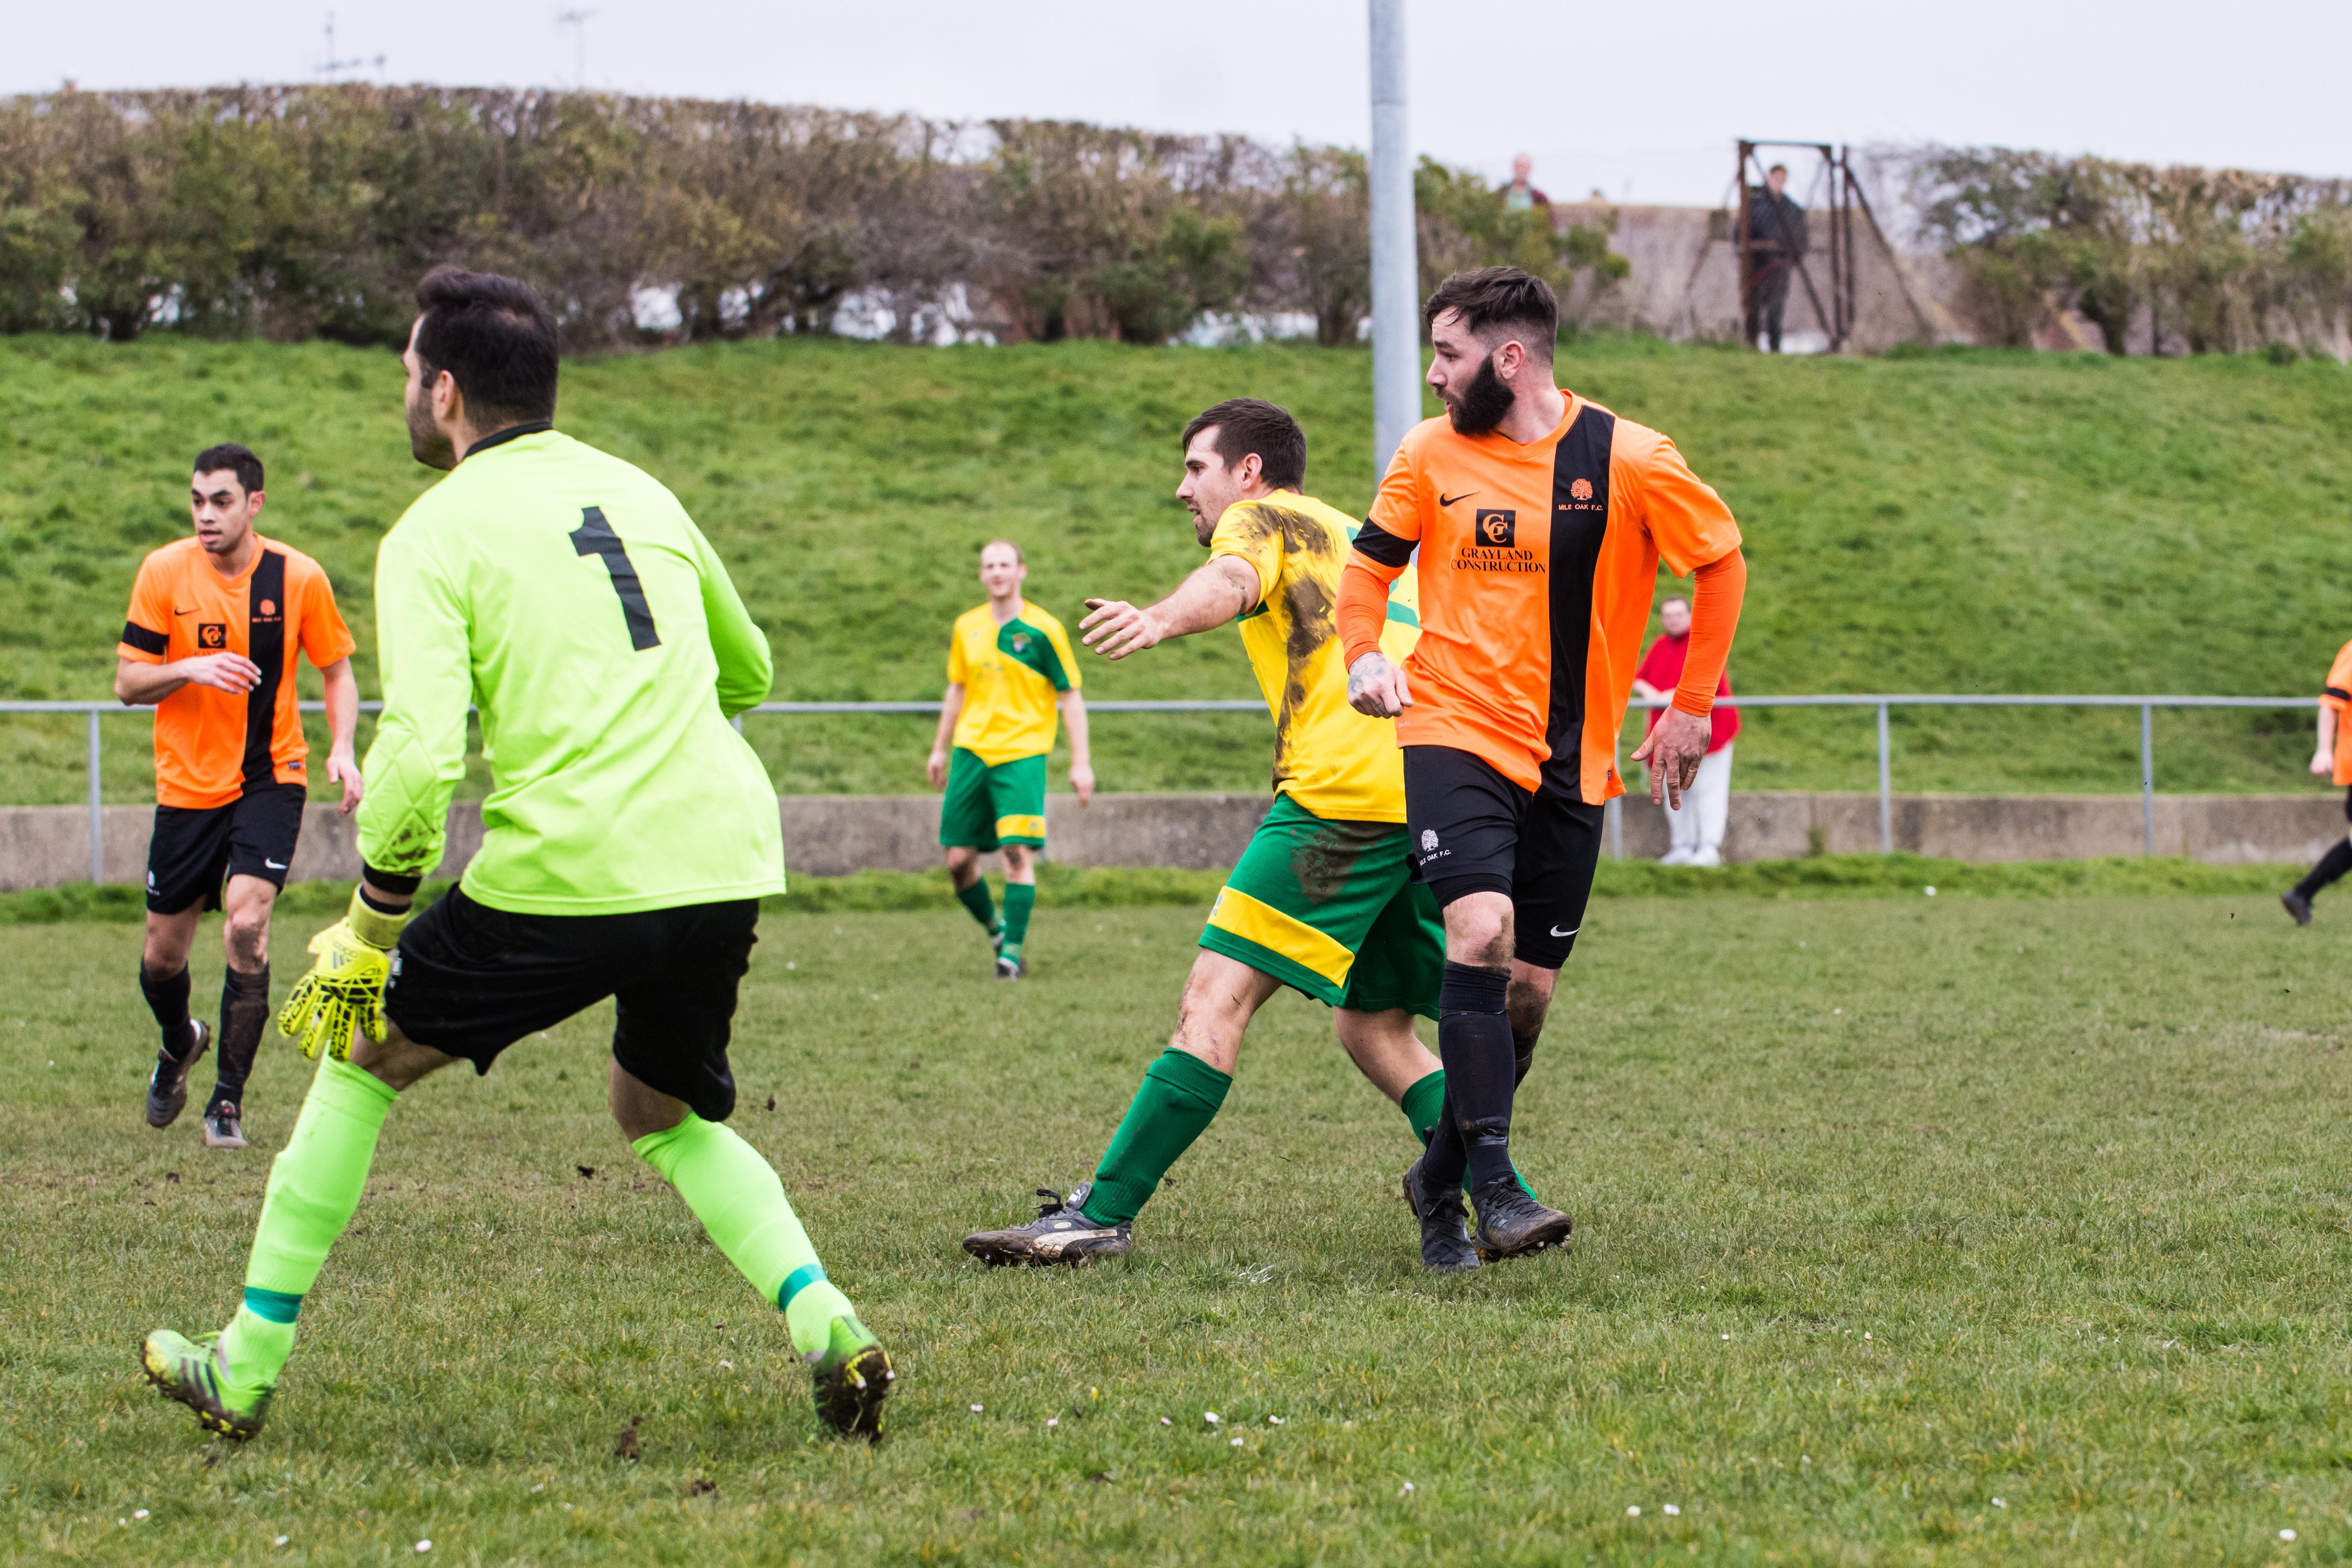 DAVID_JEFFERY Mile Oak FC vs Hailsham Town FC 24.03.18 26